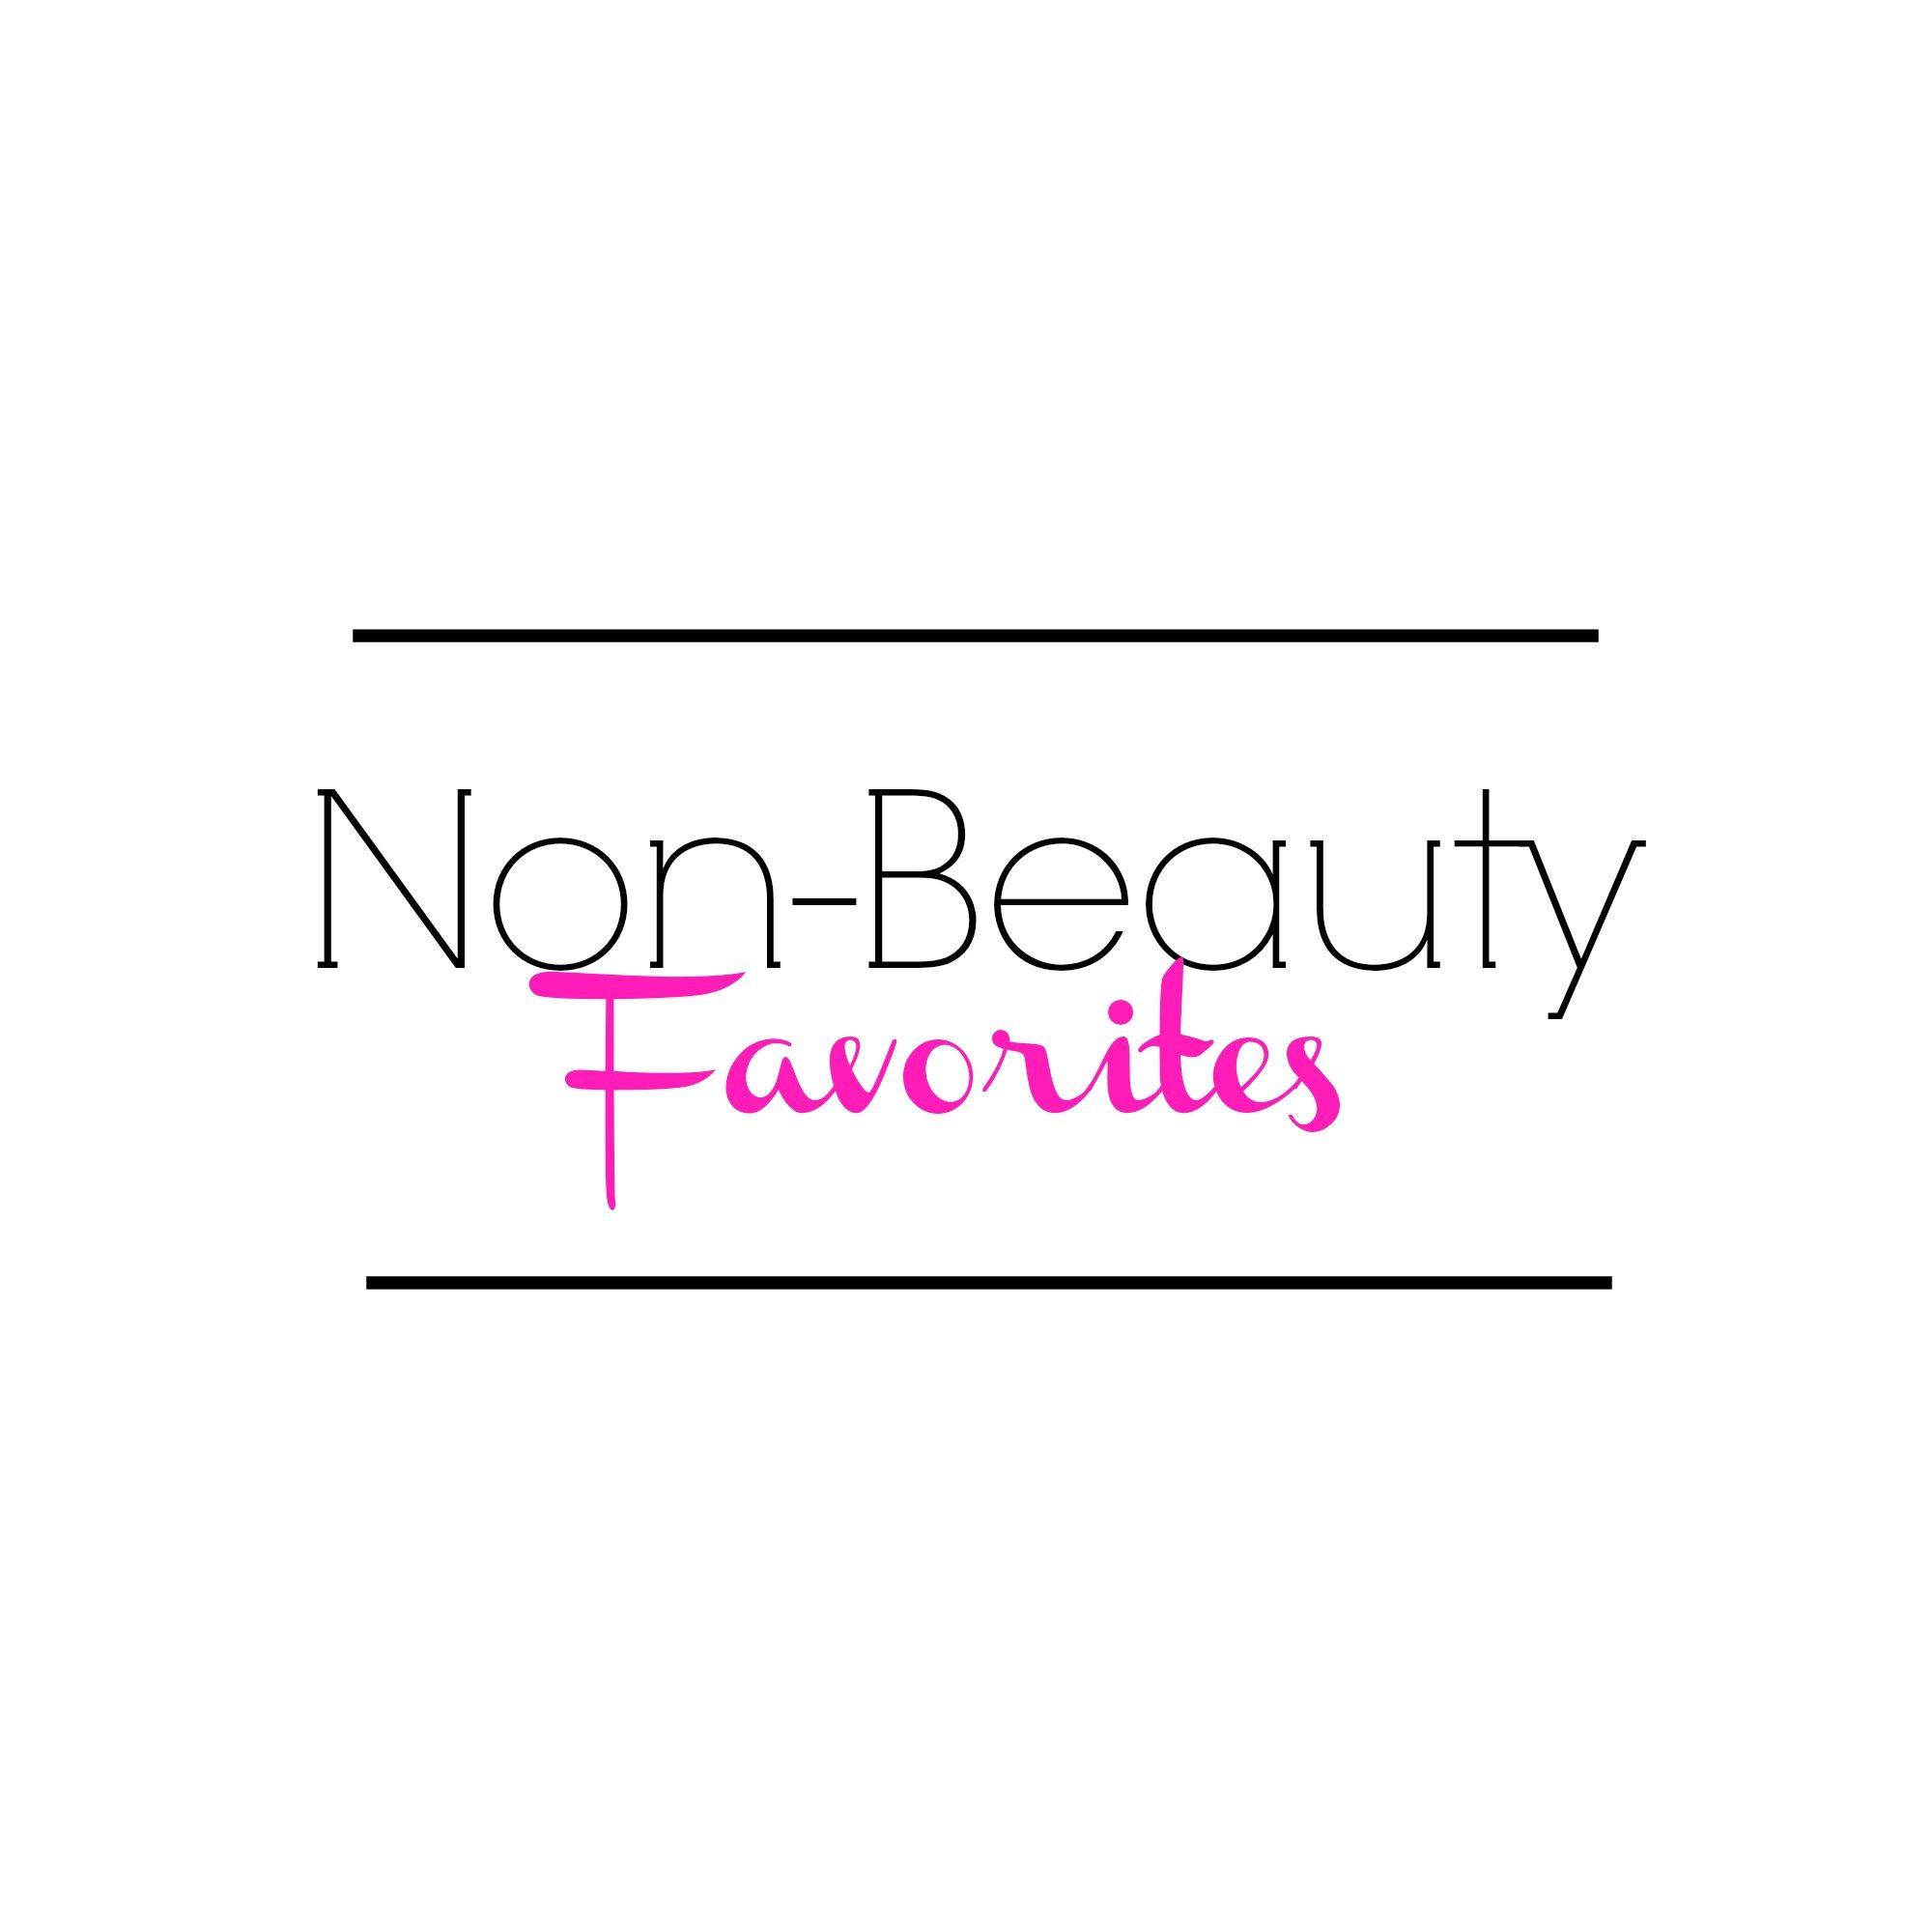 Non-BeautyFavorites